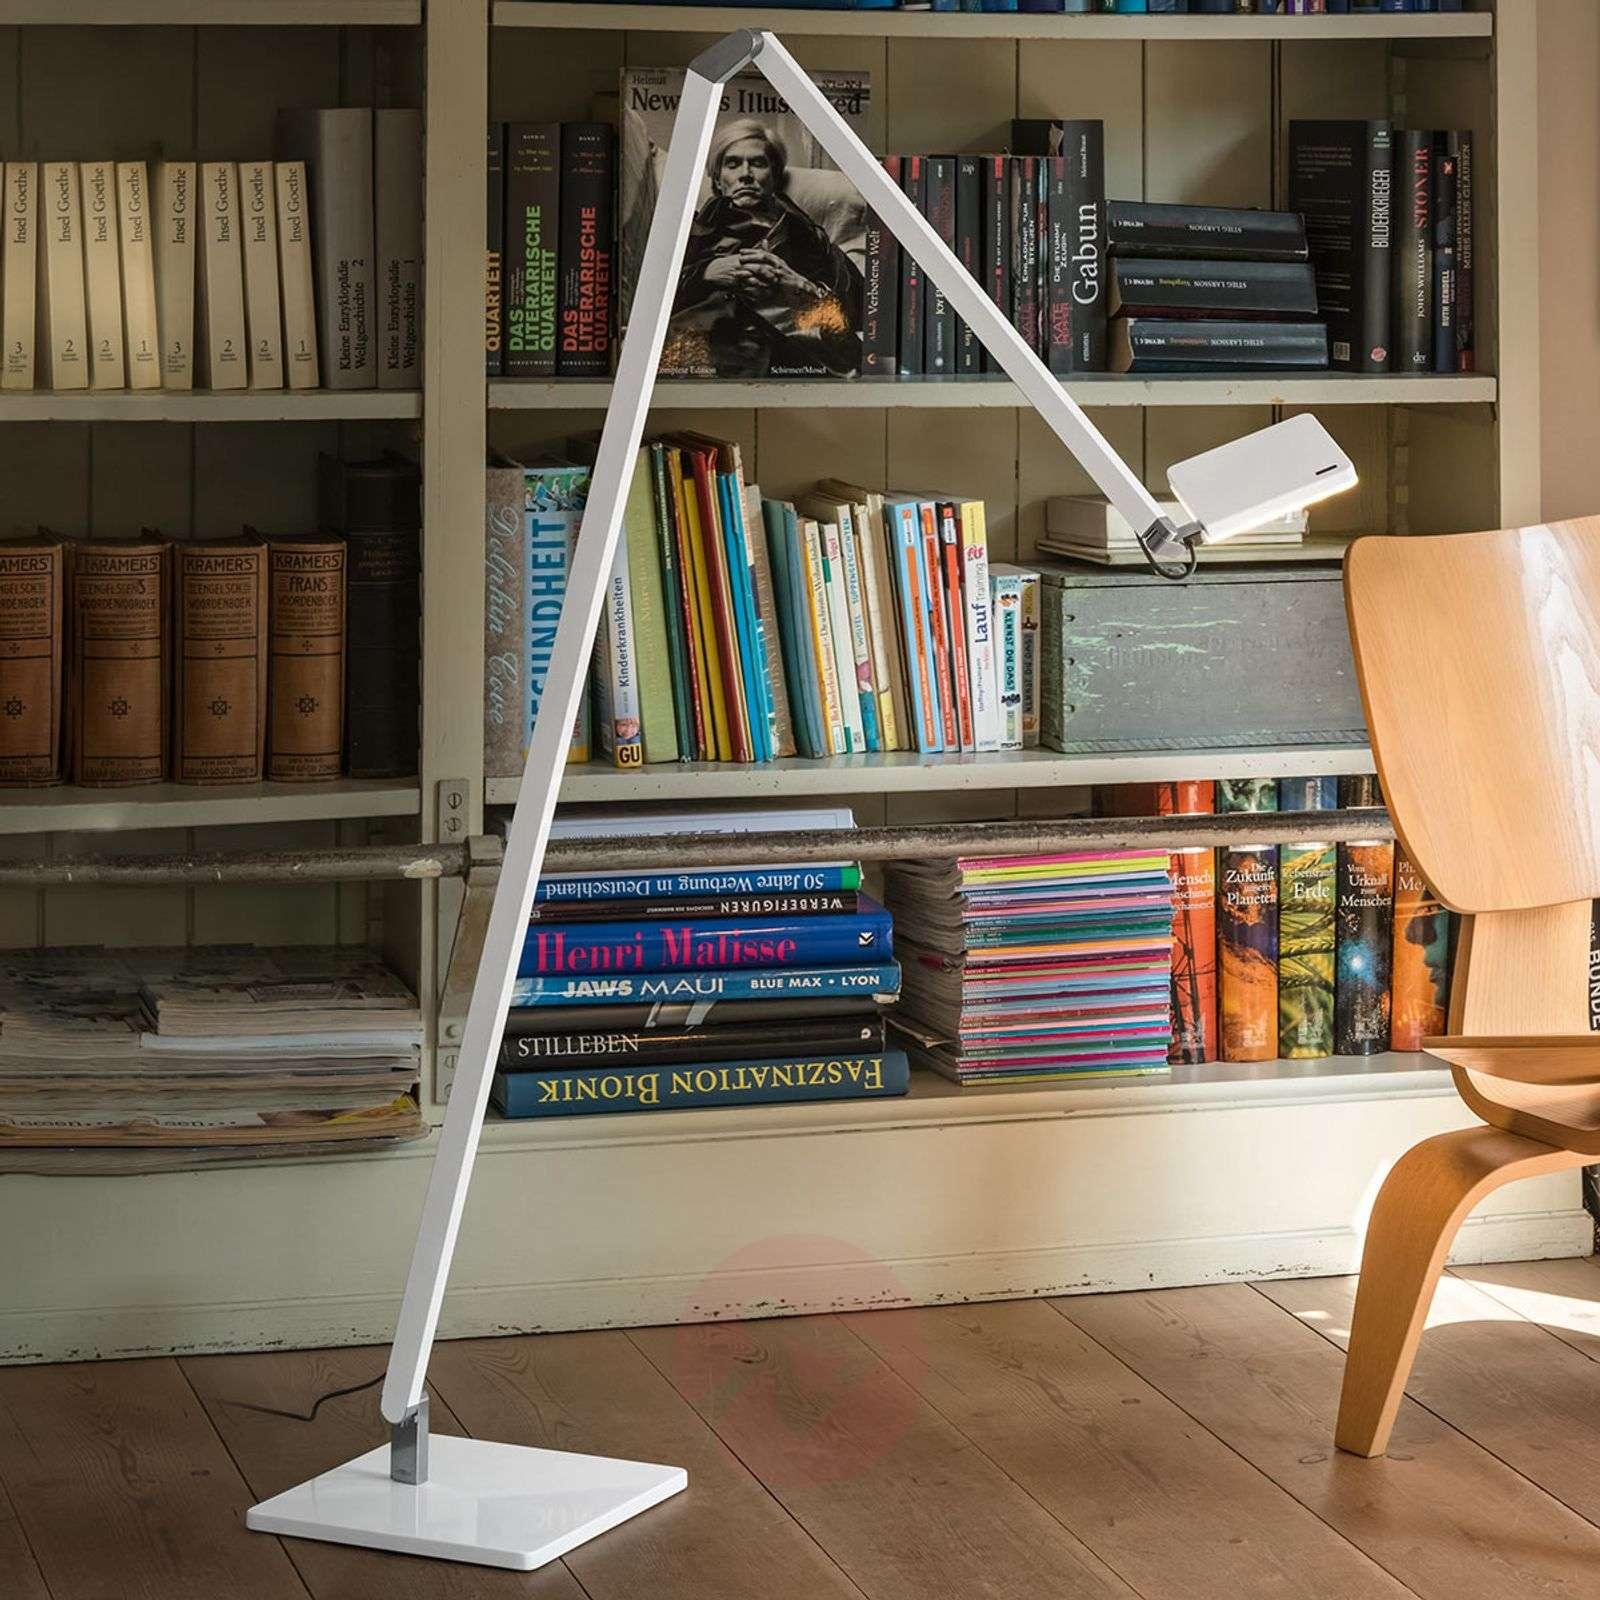 Nimbus Roxxane Home LED-lukuvalo, korkeak. valk.-7018004-01